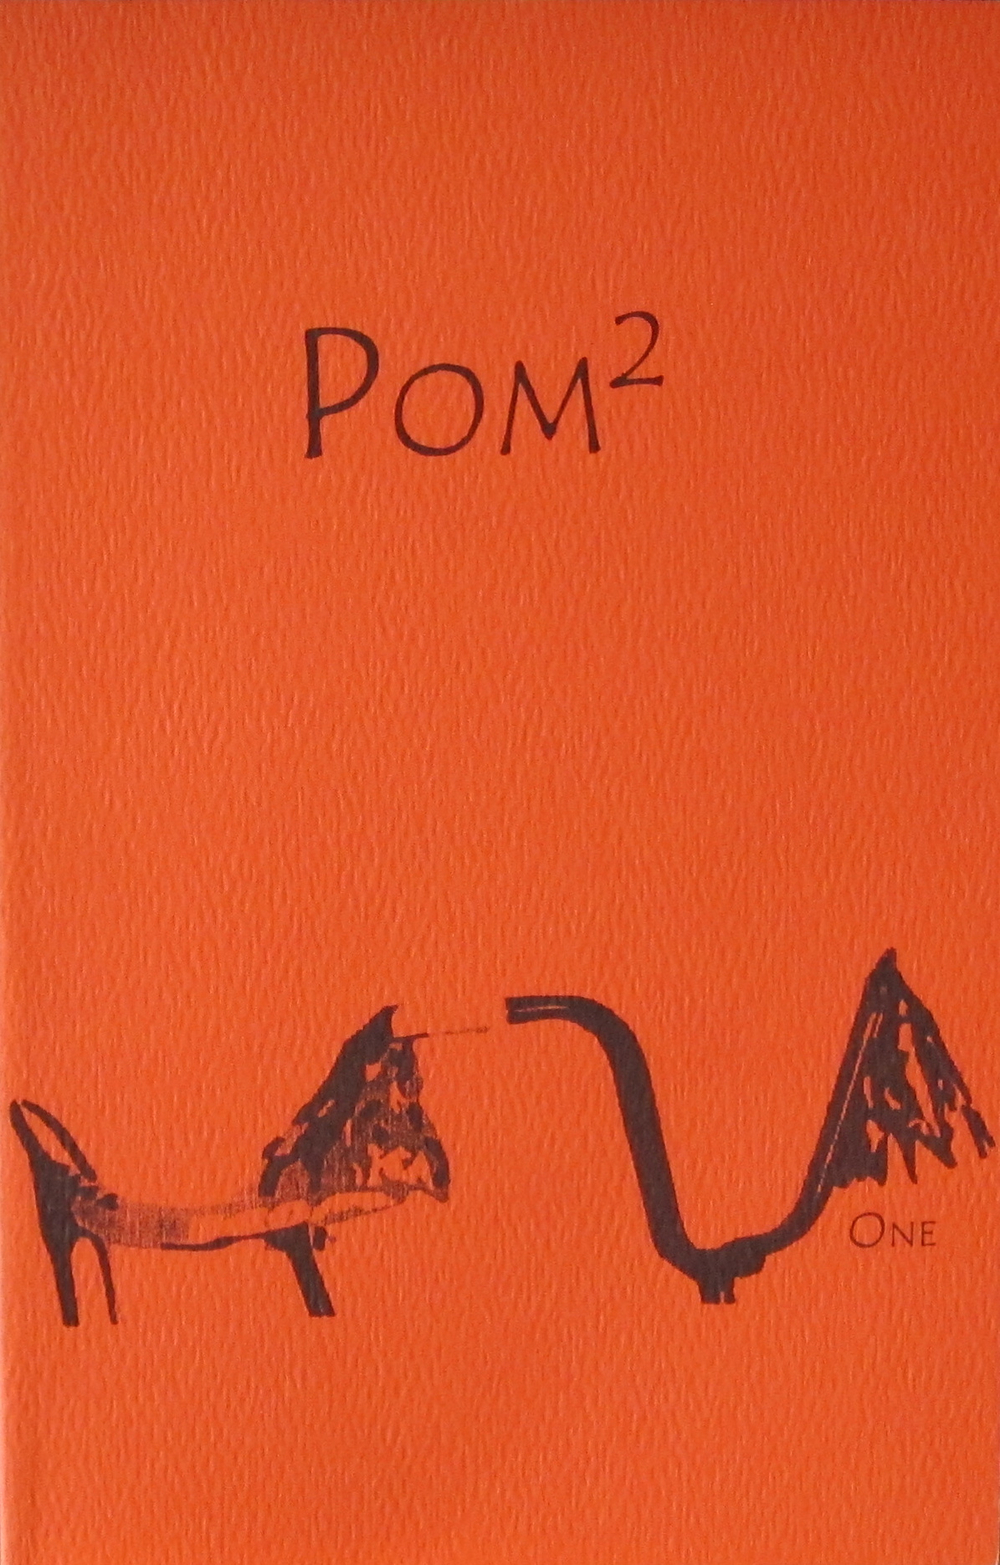 P M pom2.jpg